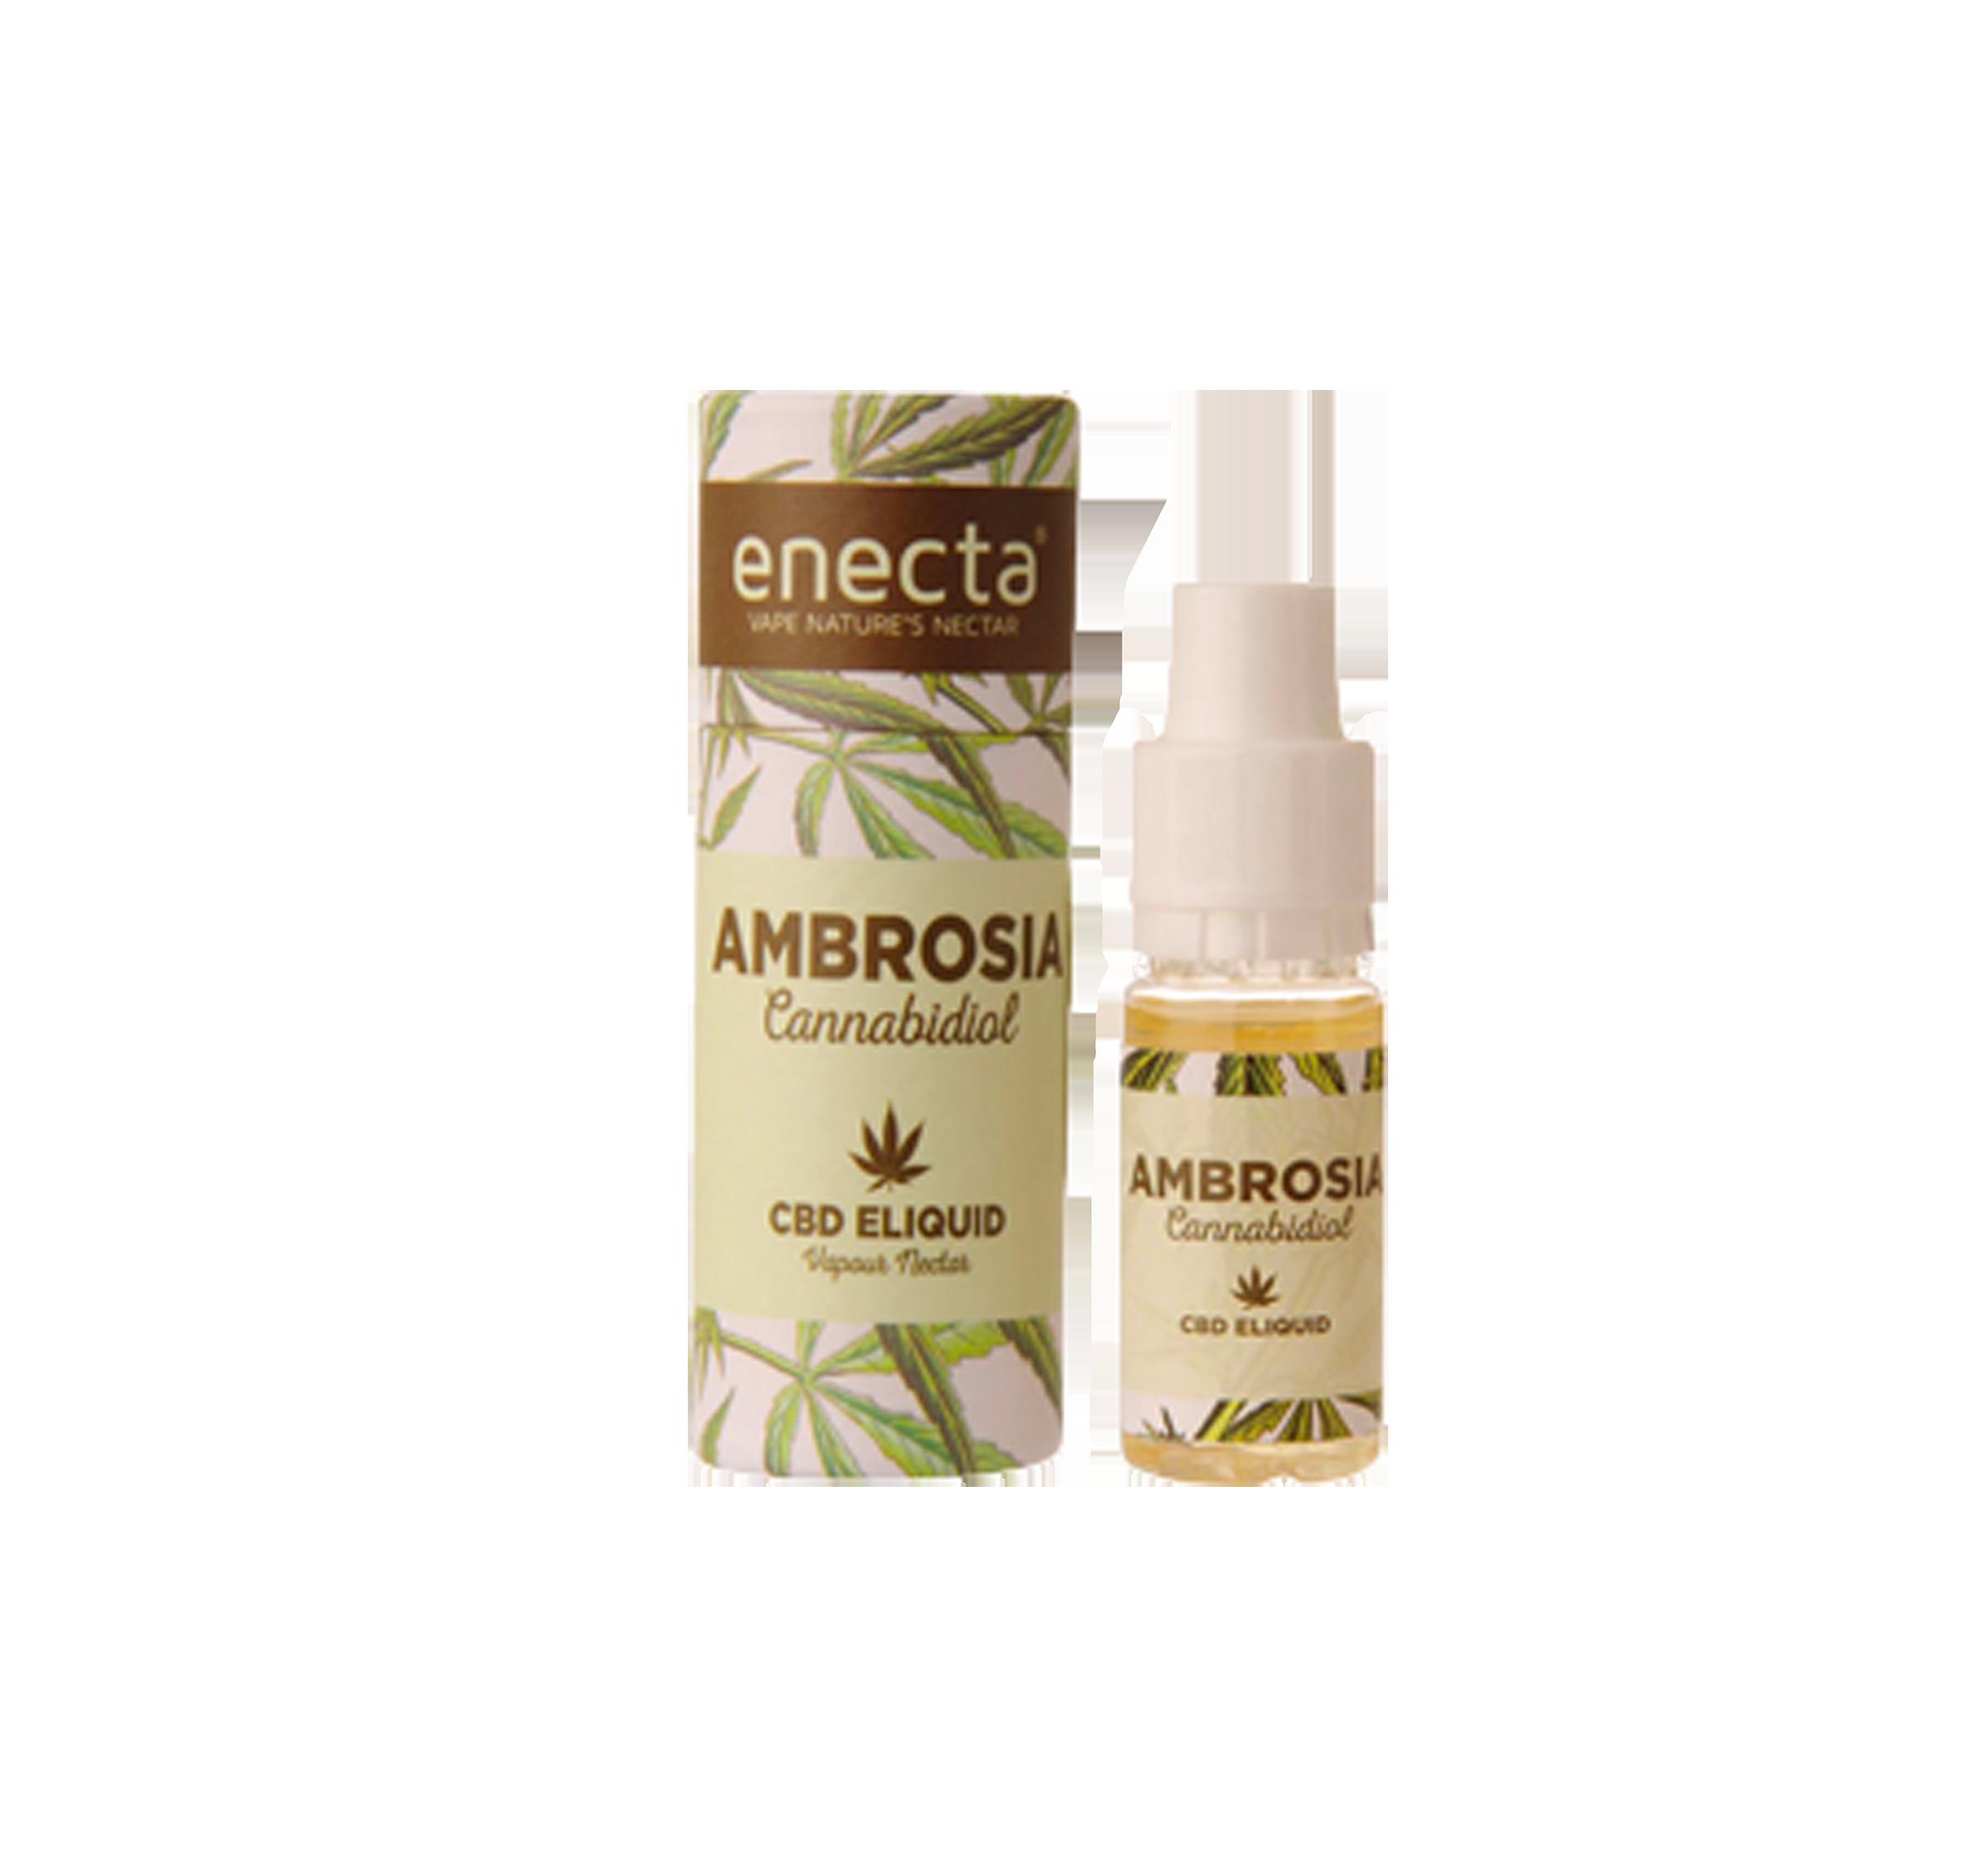 CBD-Liquid Ambrosia Tabacco | 10 ml mit 20 mg CBD im Preisvergleich